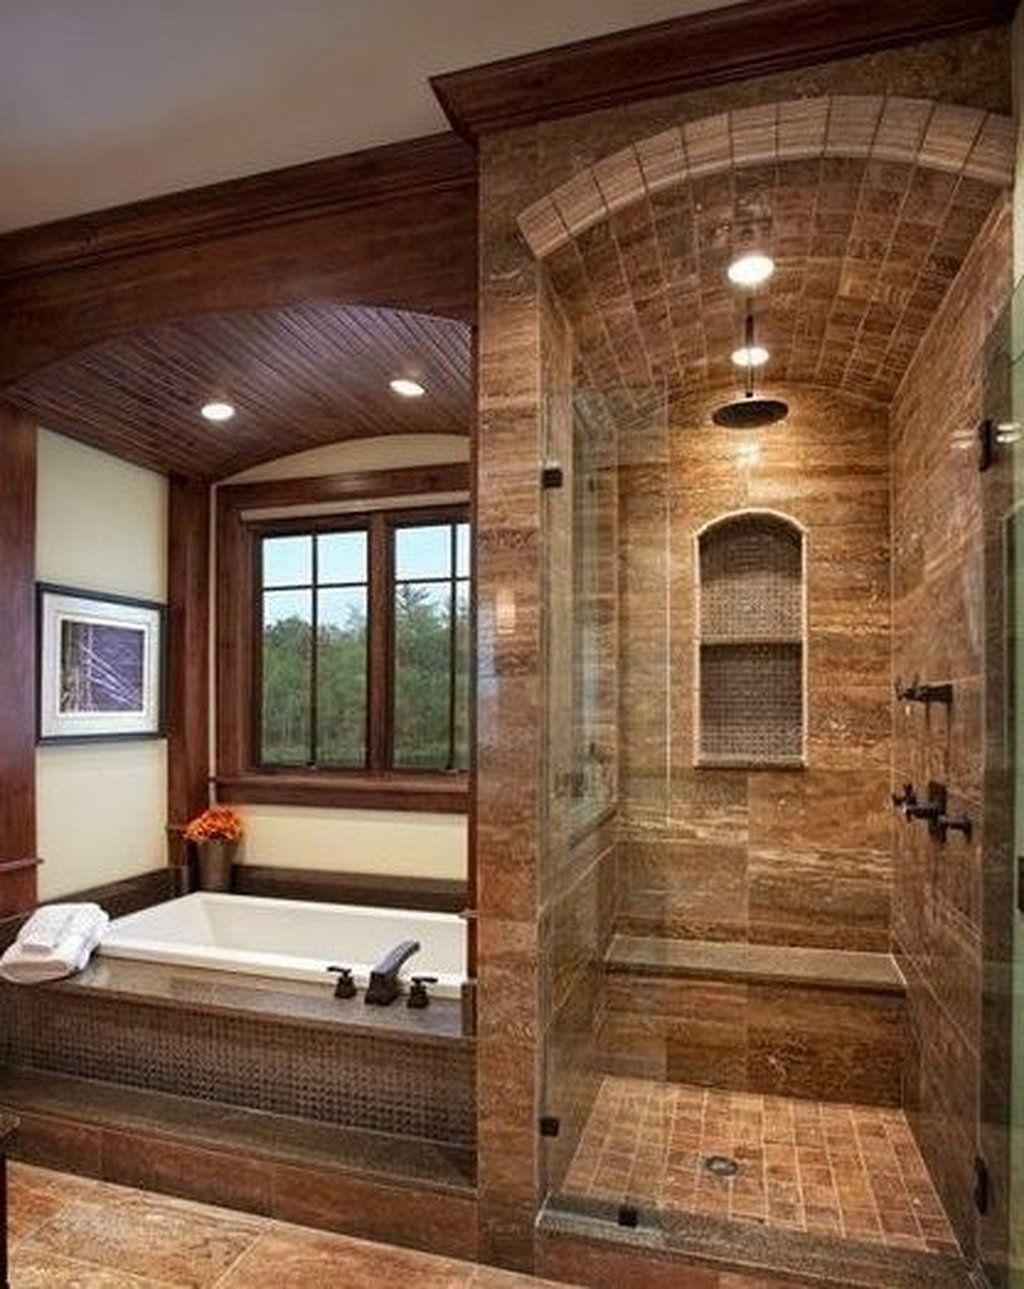 25 Cozy Rustic Bathroom Decor To Guide Your Renovation - W13